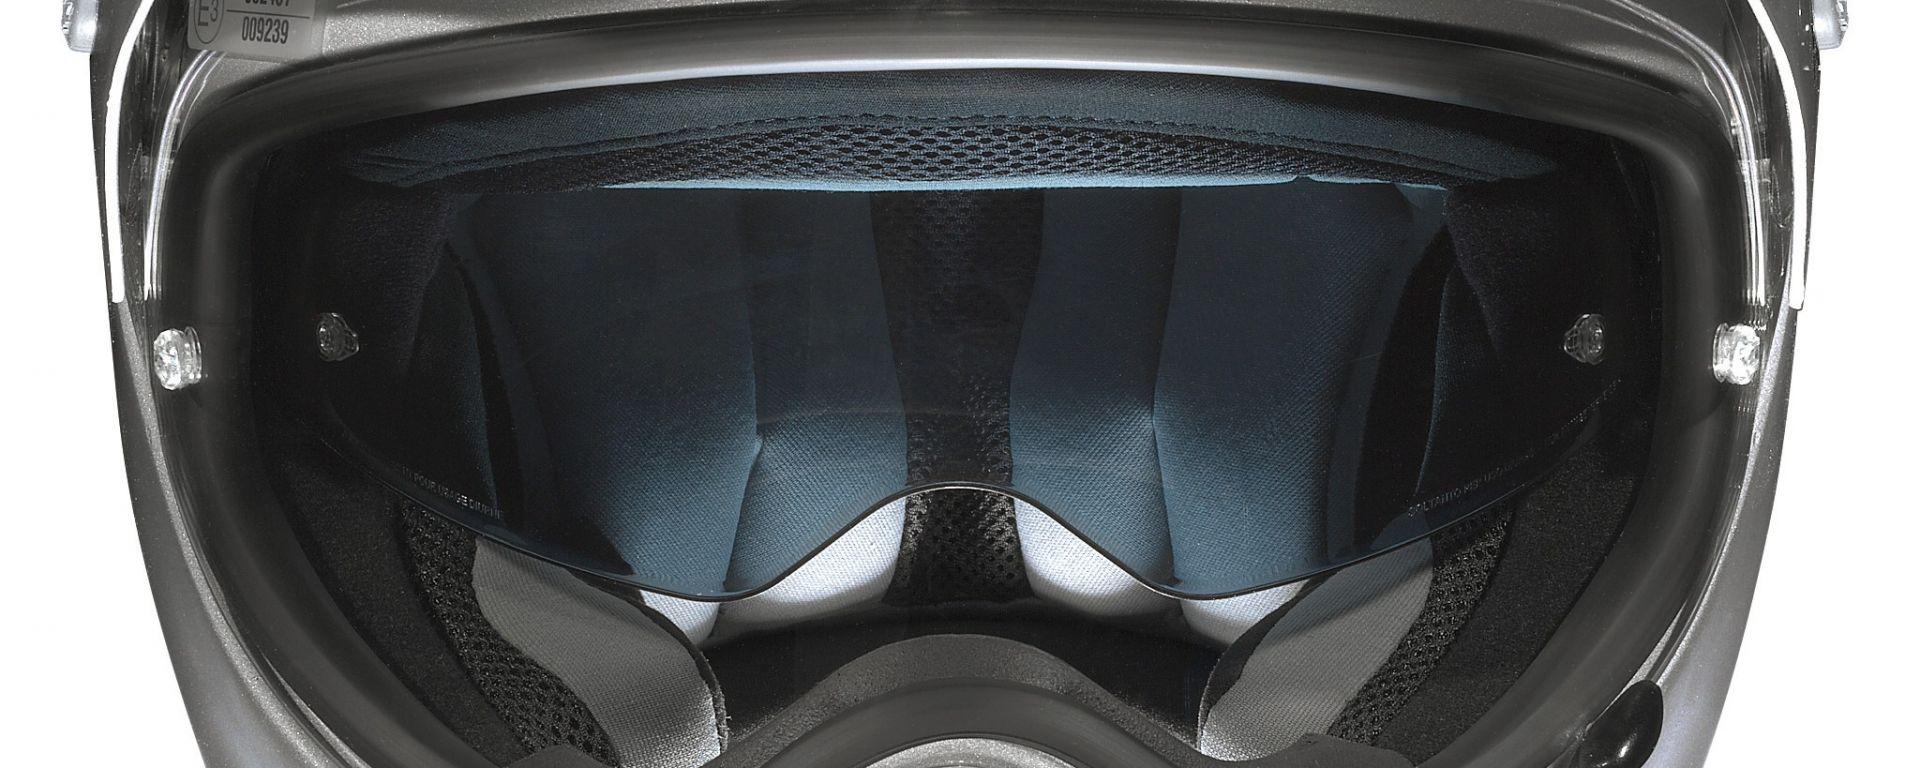 X-LITE 551: Il casco Enduro Touring